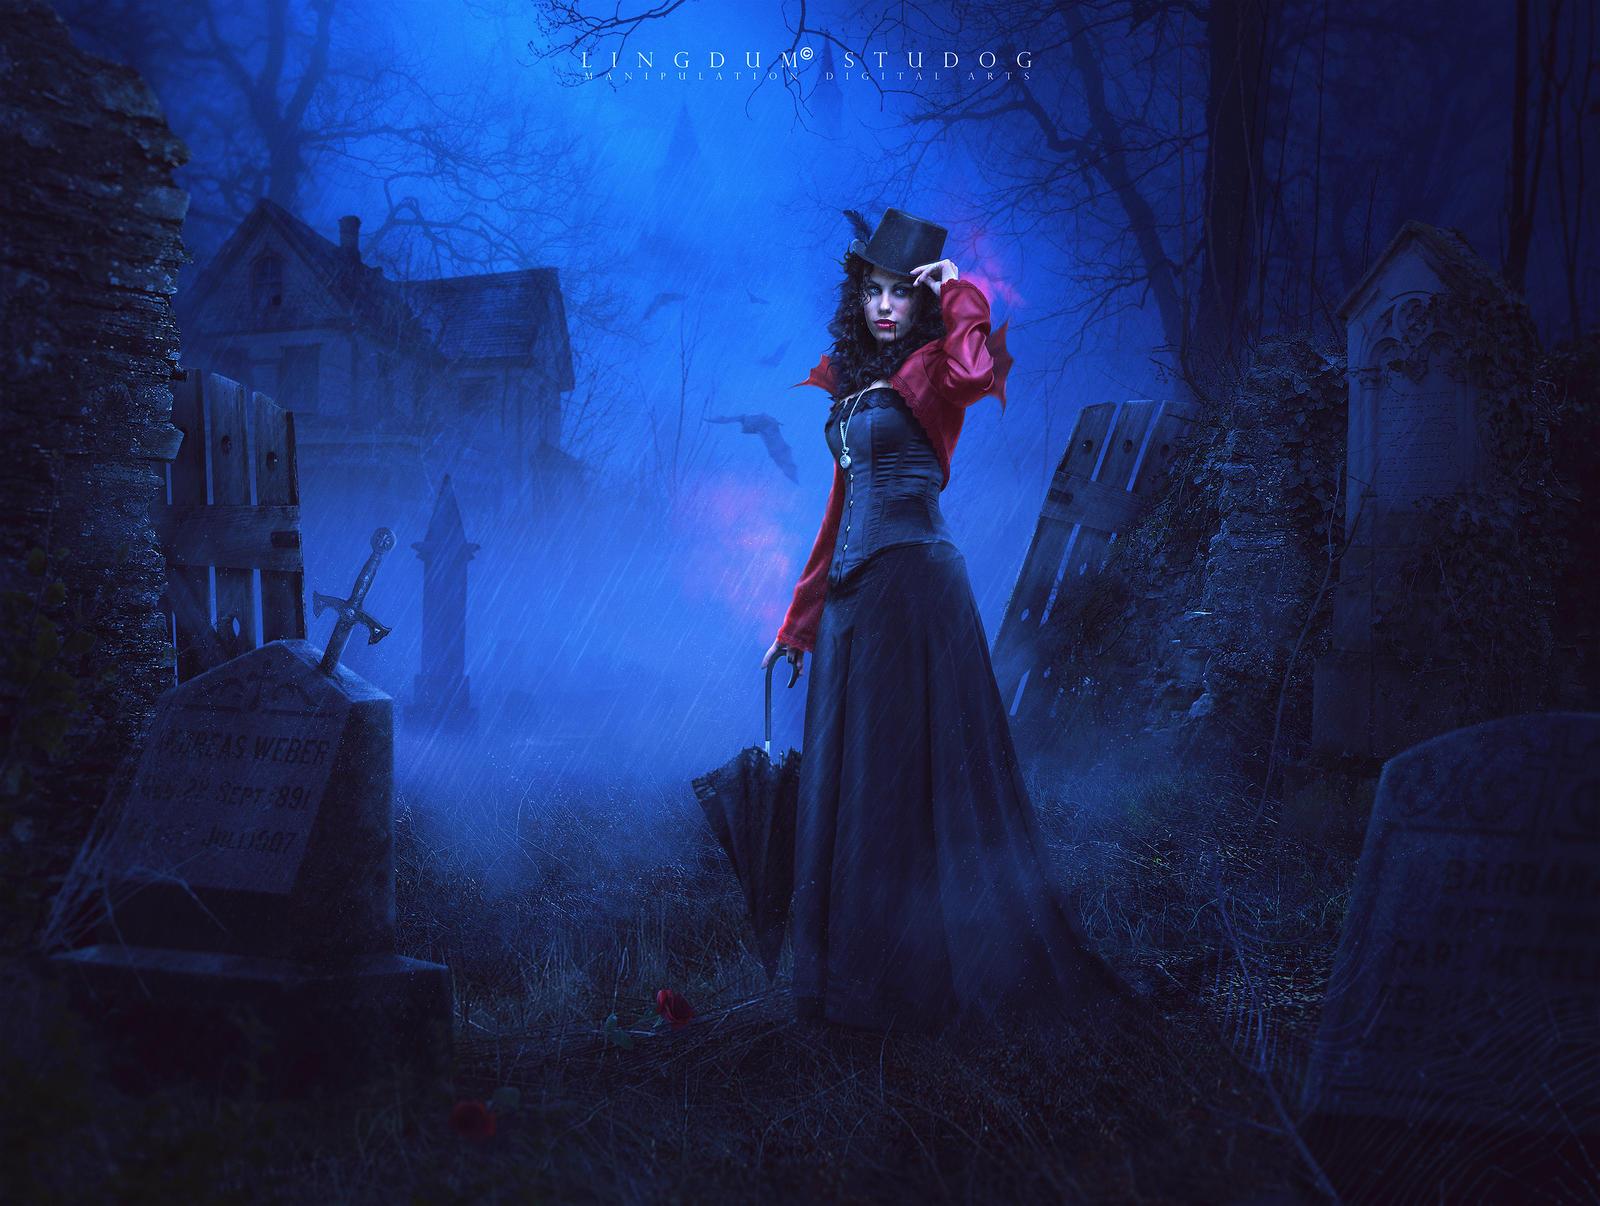 Transylvania by LINGDUMSTUDOG